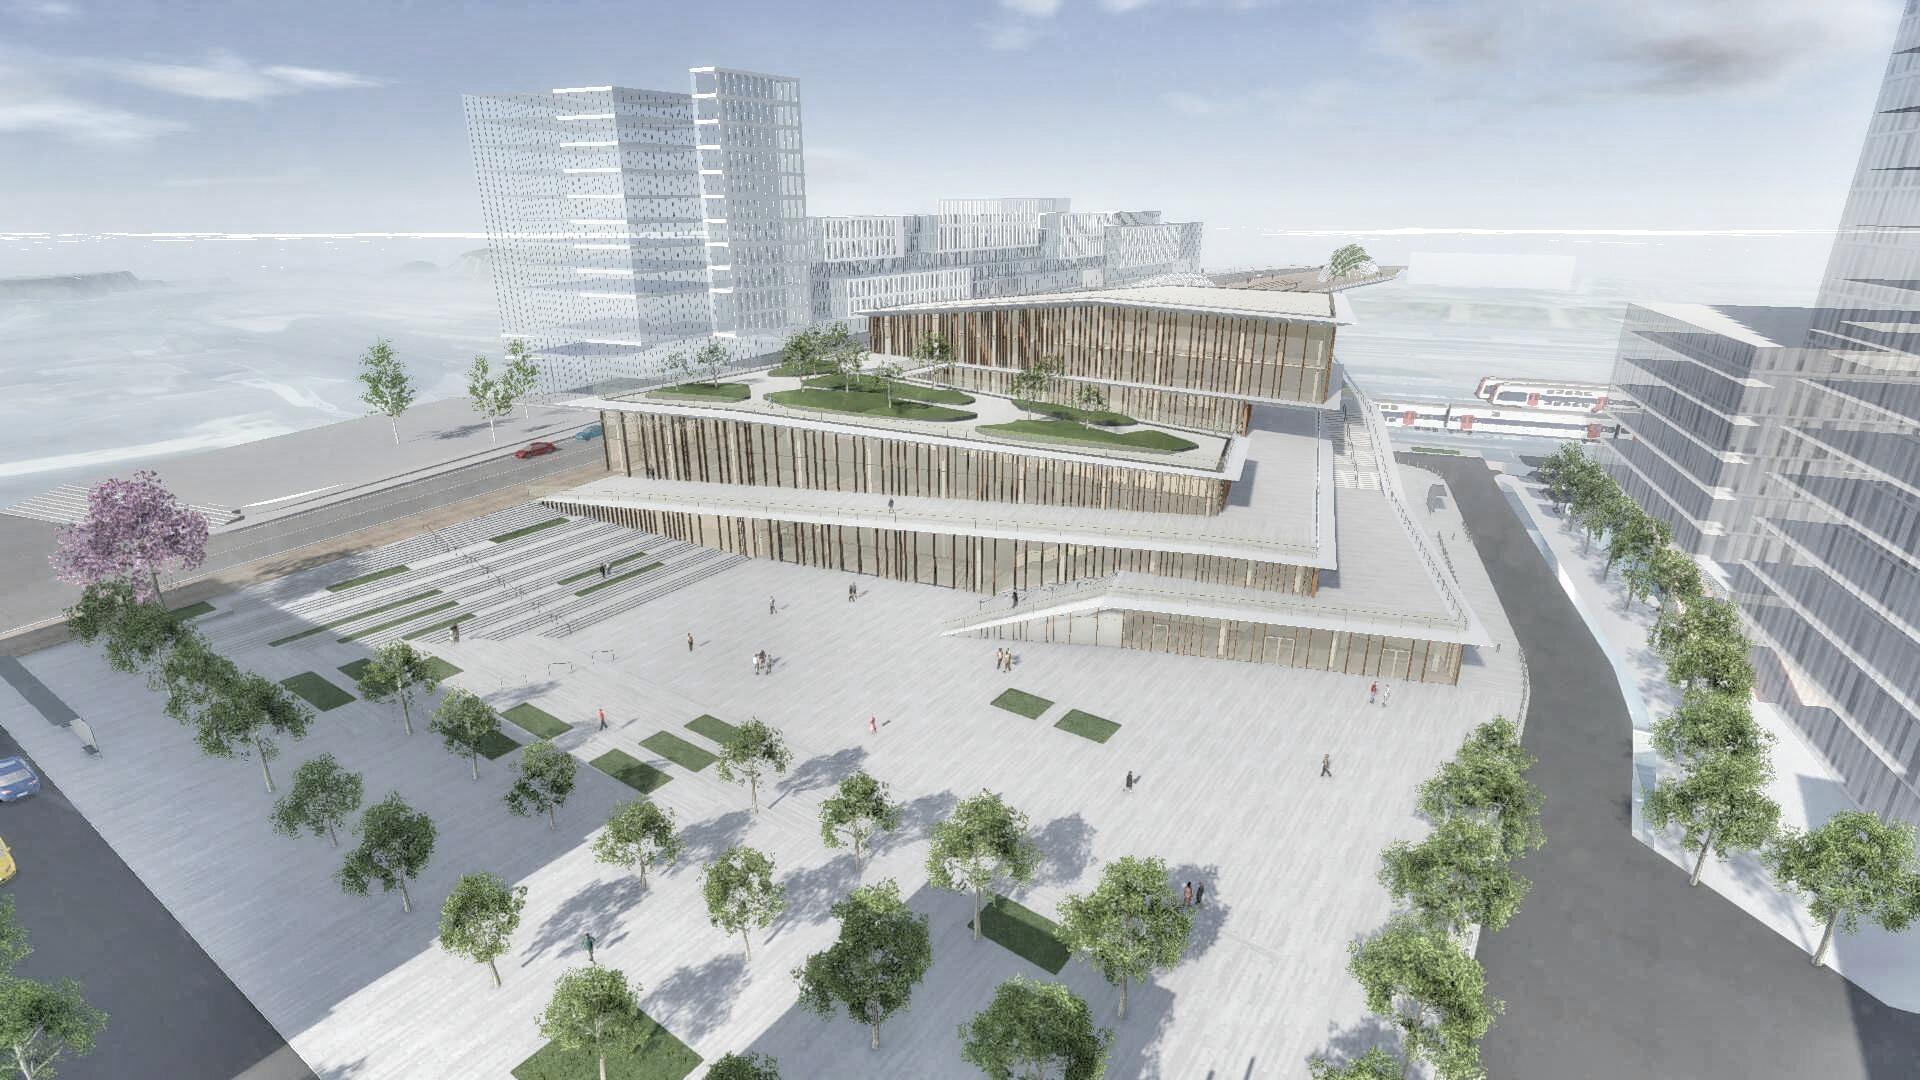 Gare Saint-Denis Pleyel